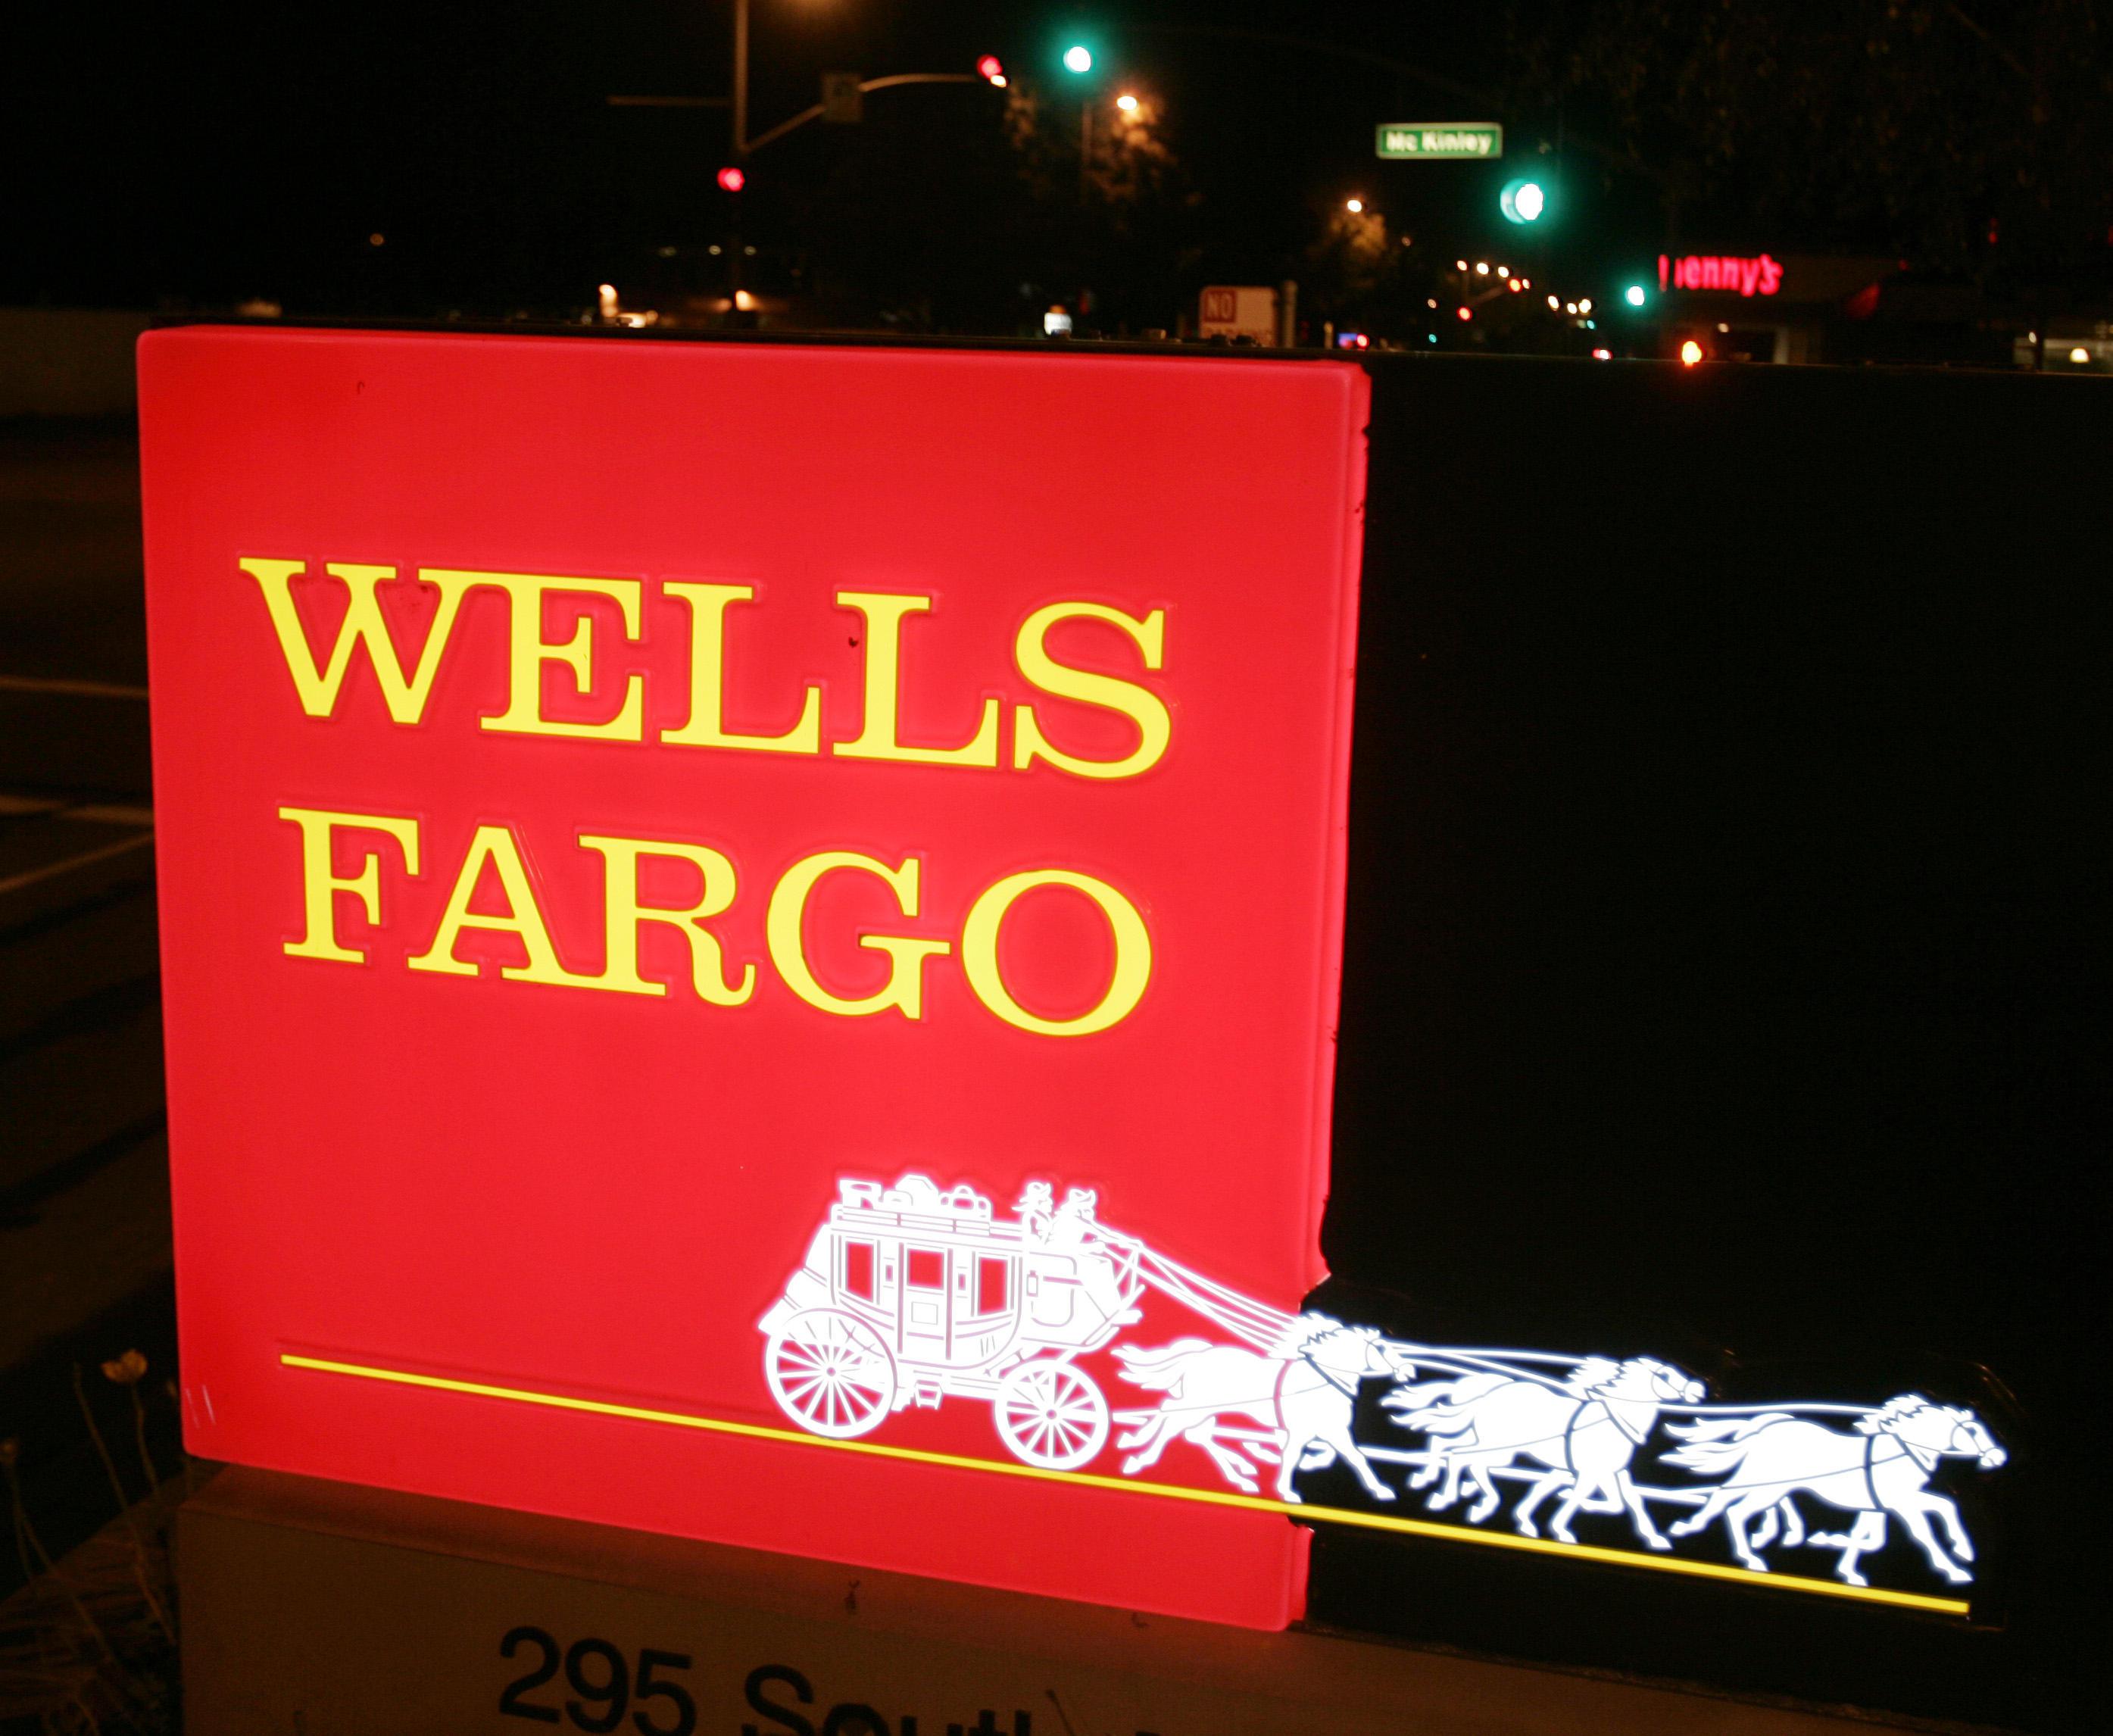 Best Of Photos Of Wells Fargo Business Credit Card - Business ...